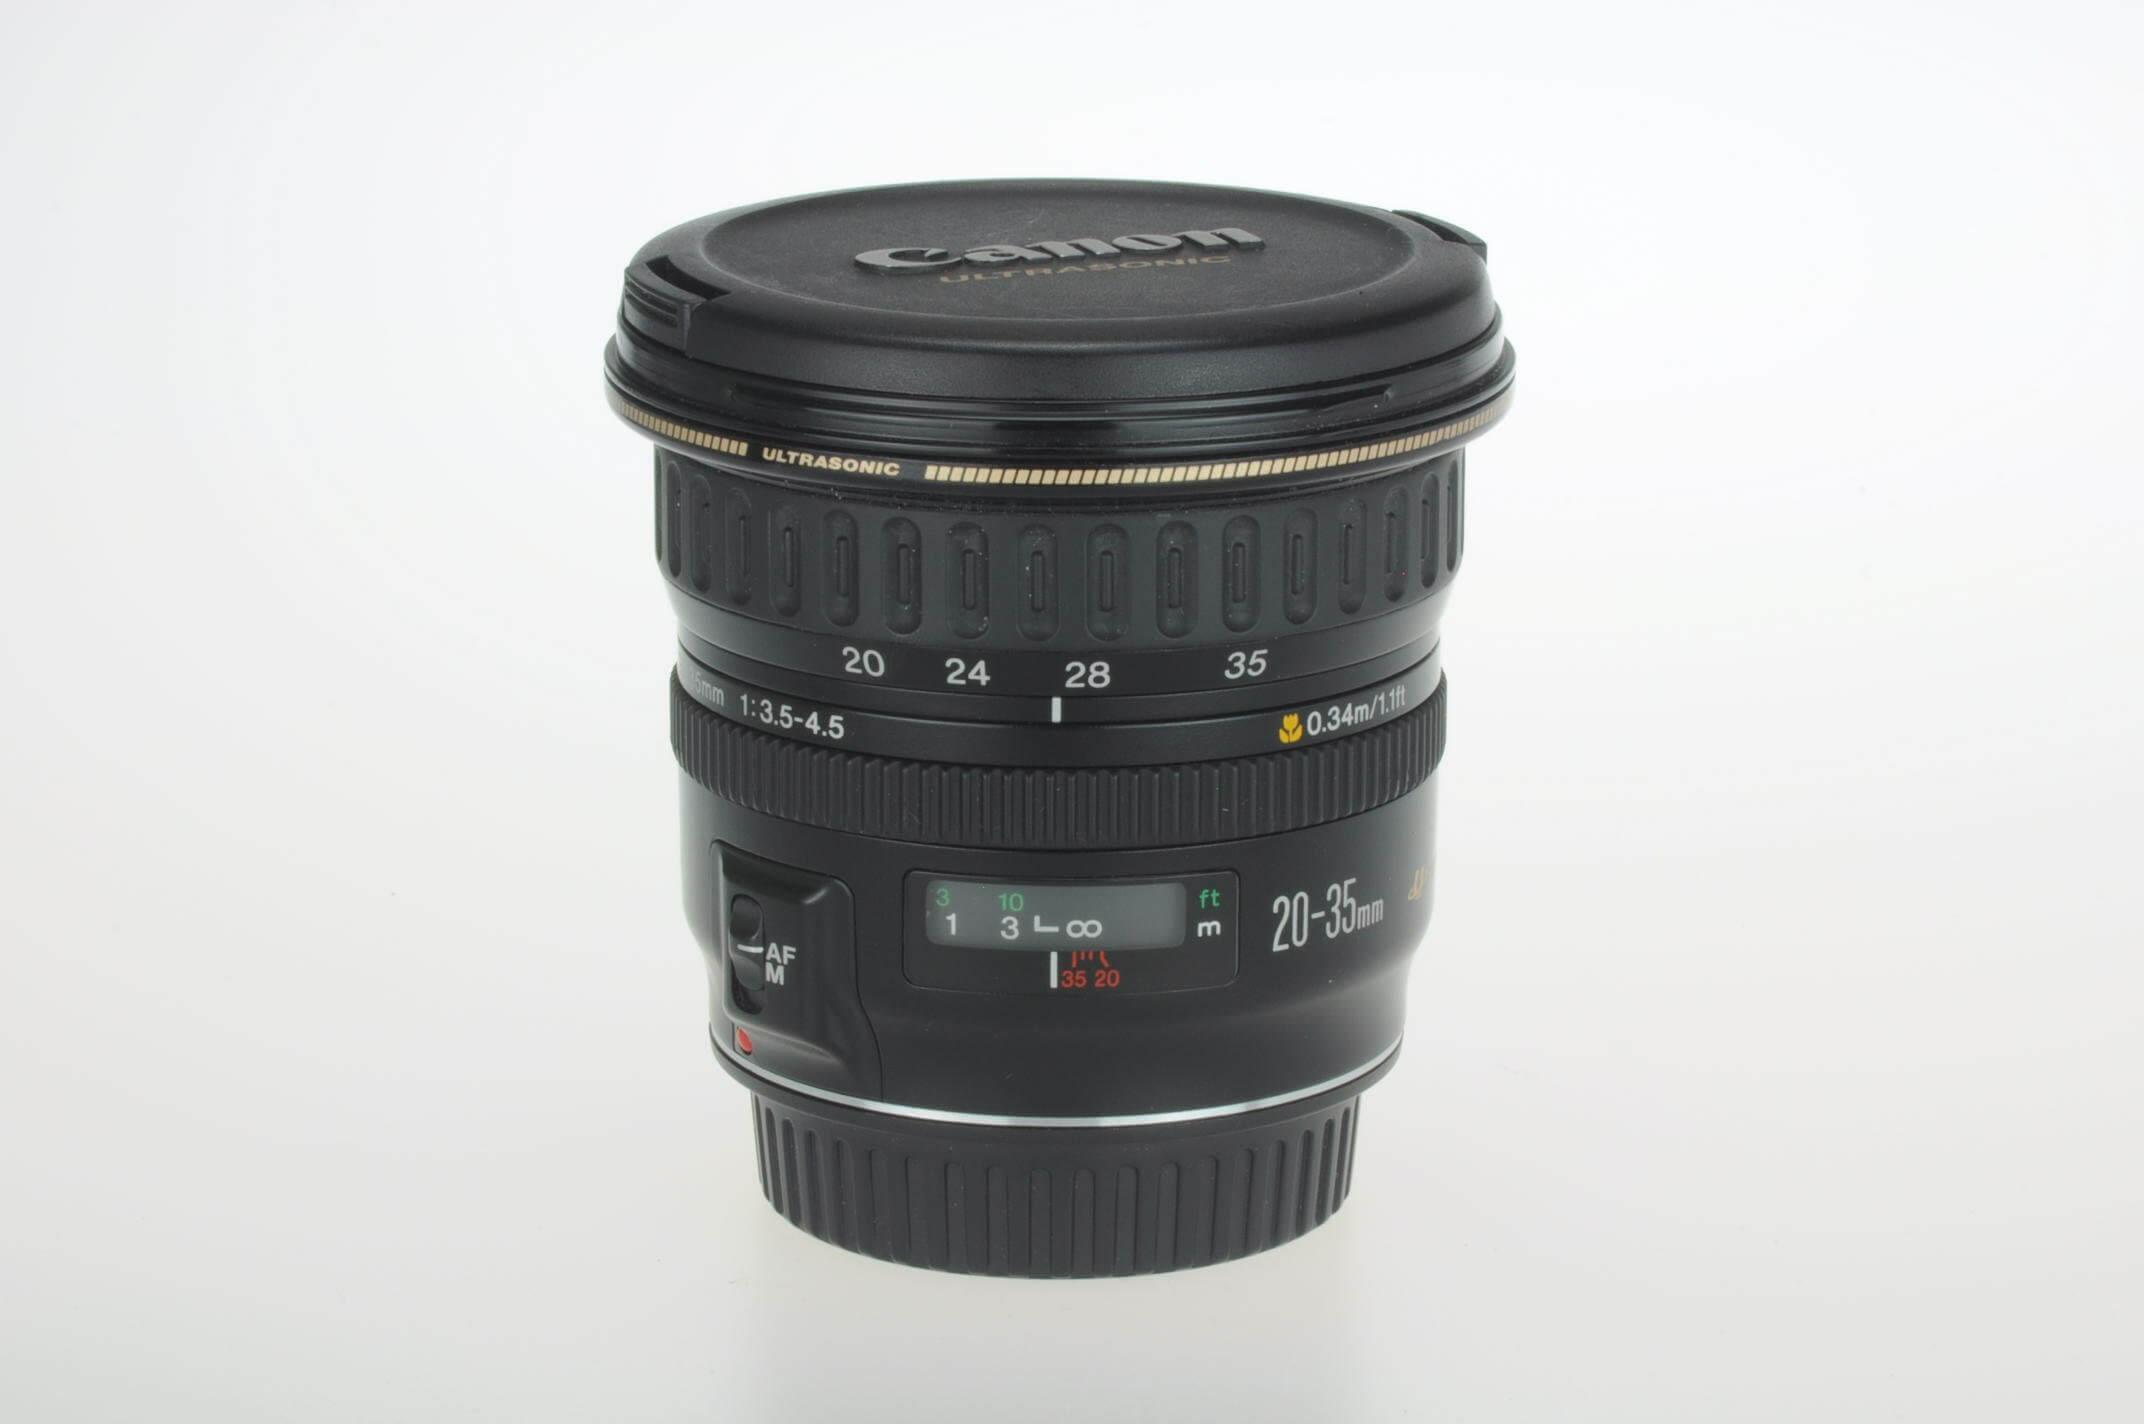 Canon 20-35mm f3.5-4.5 USM lens